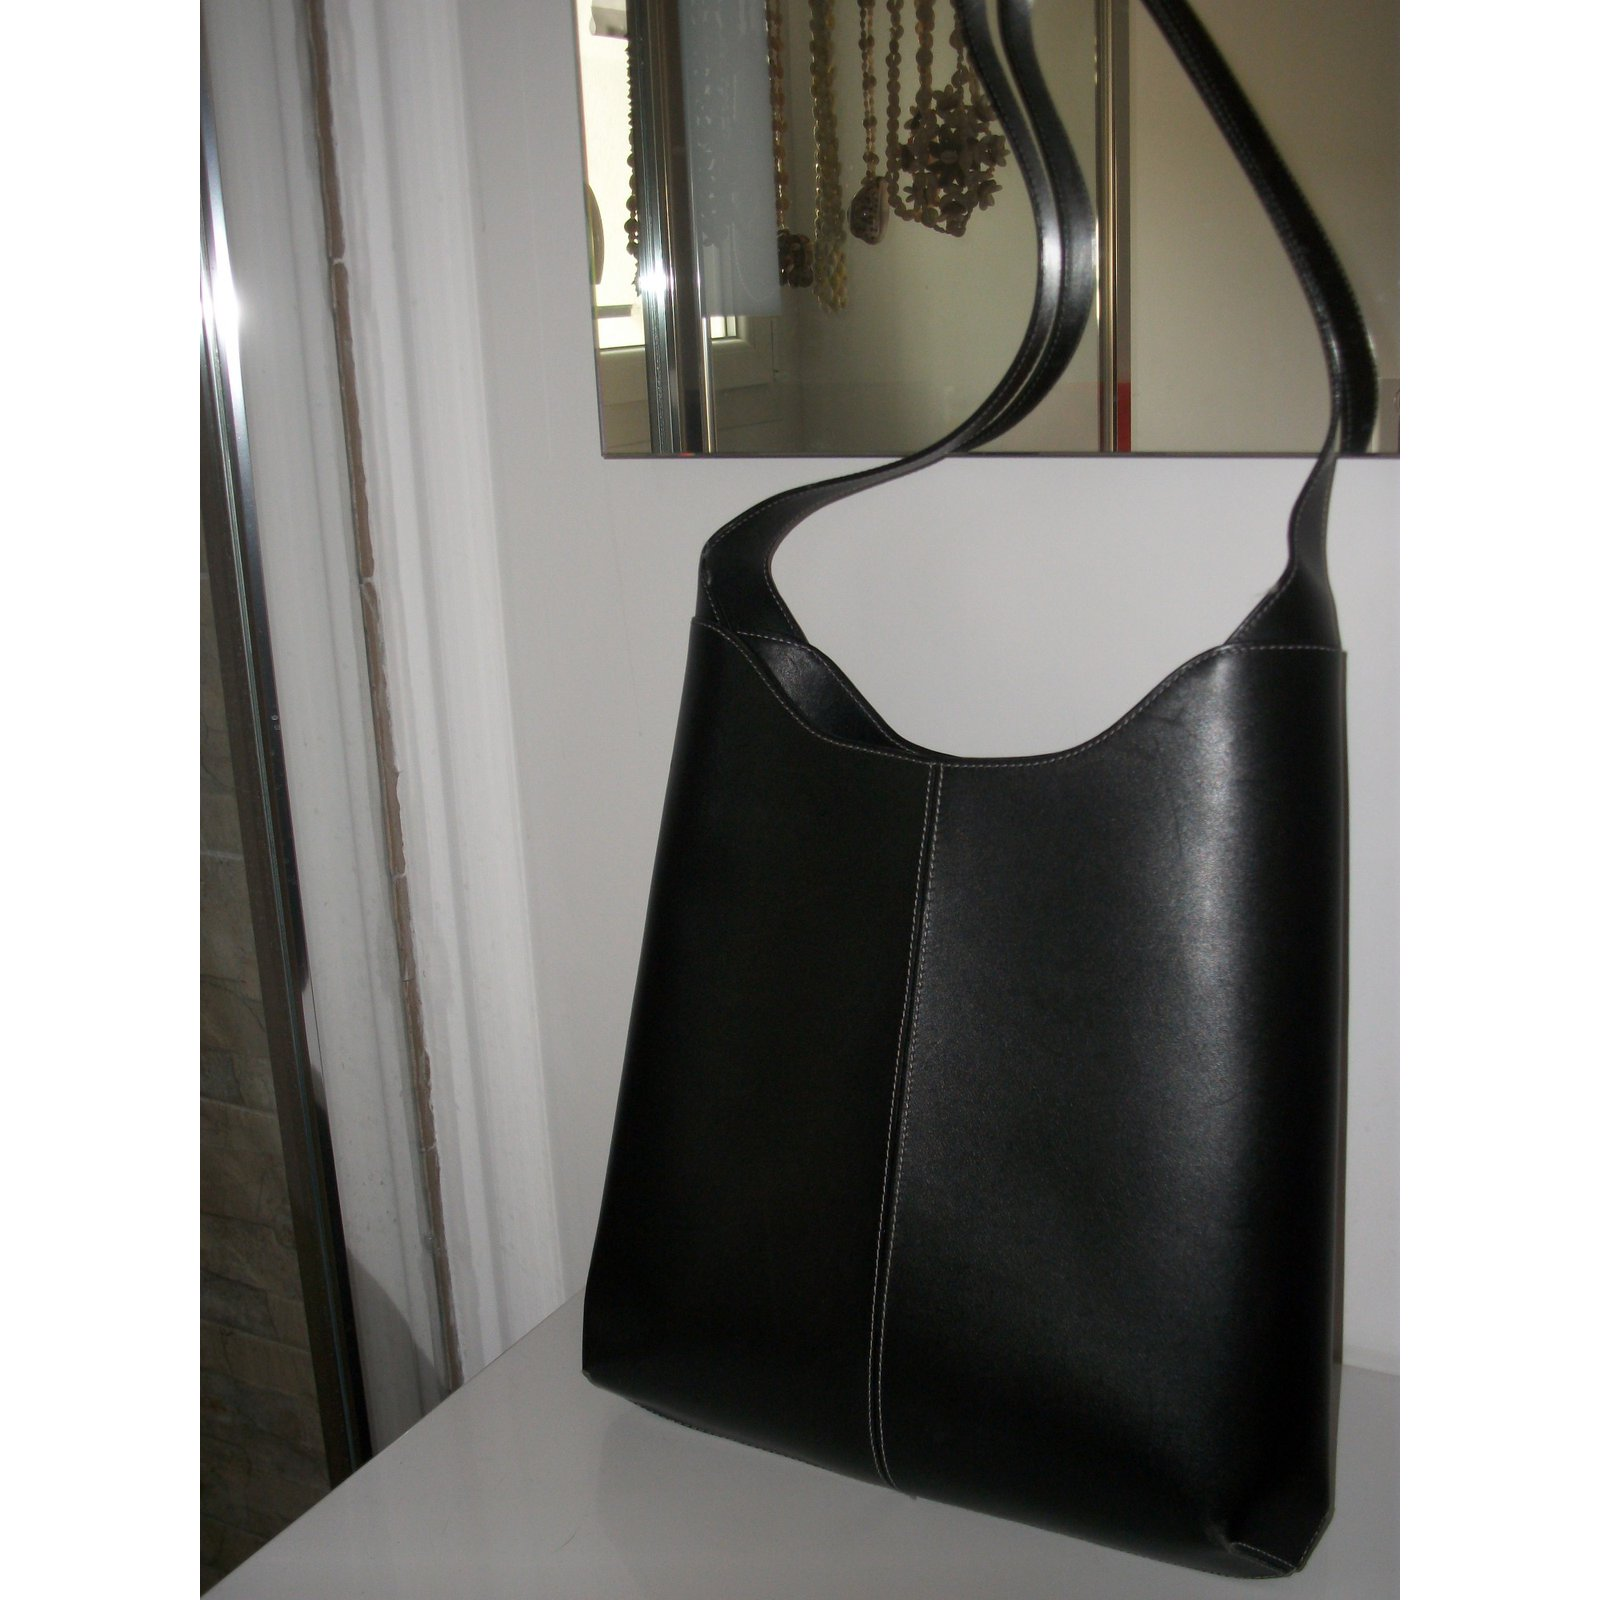 eff2e00b18ee Facebook · Pin This. Lancel Handbags Handbags Leather Black ref.65715